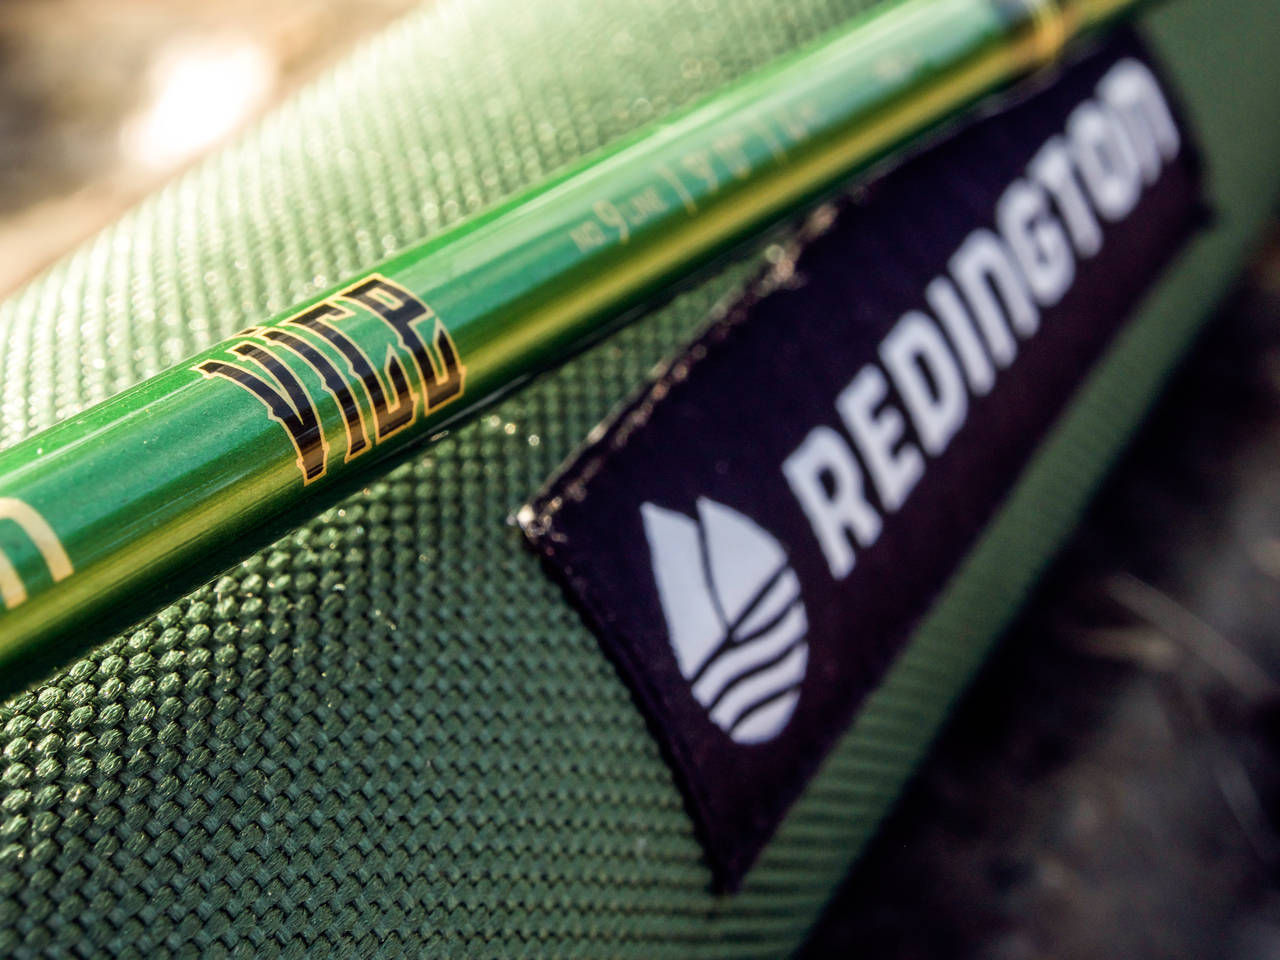 Redington VICE fly rod